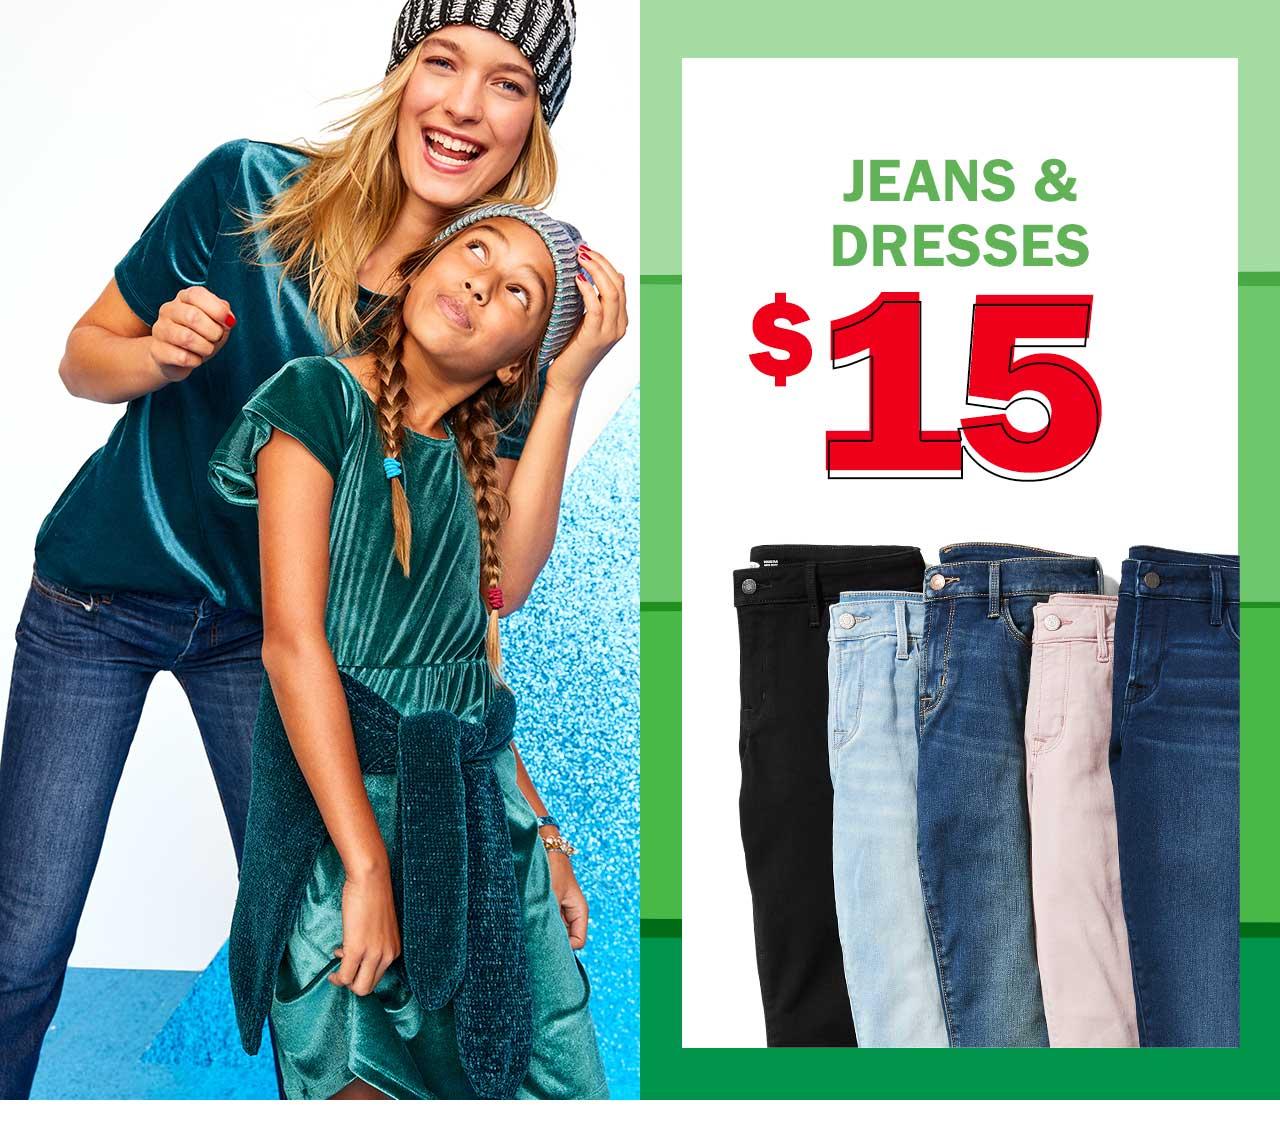 Jeans & dresses $15